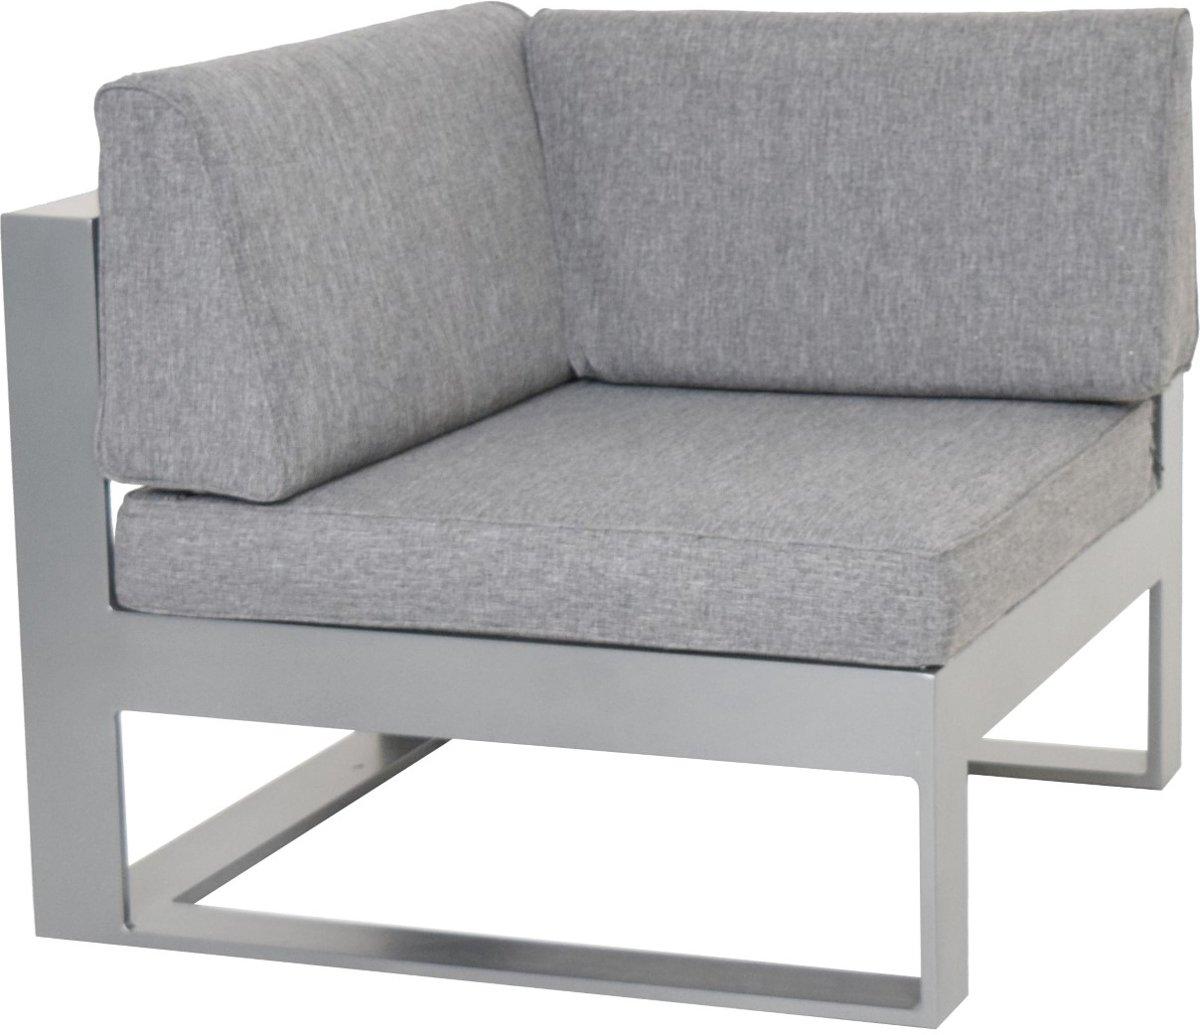 Stratos Lounge Small Corner Grey kopen